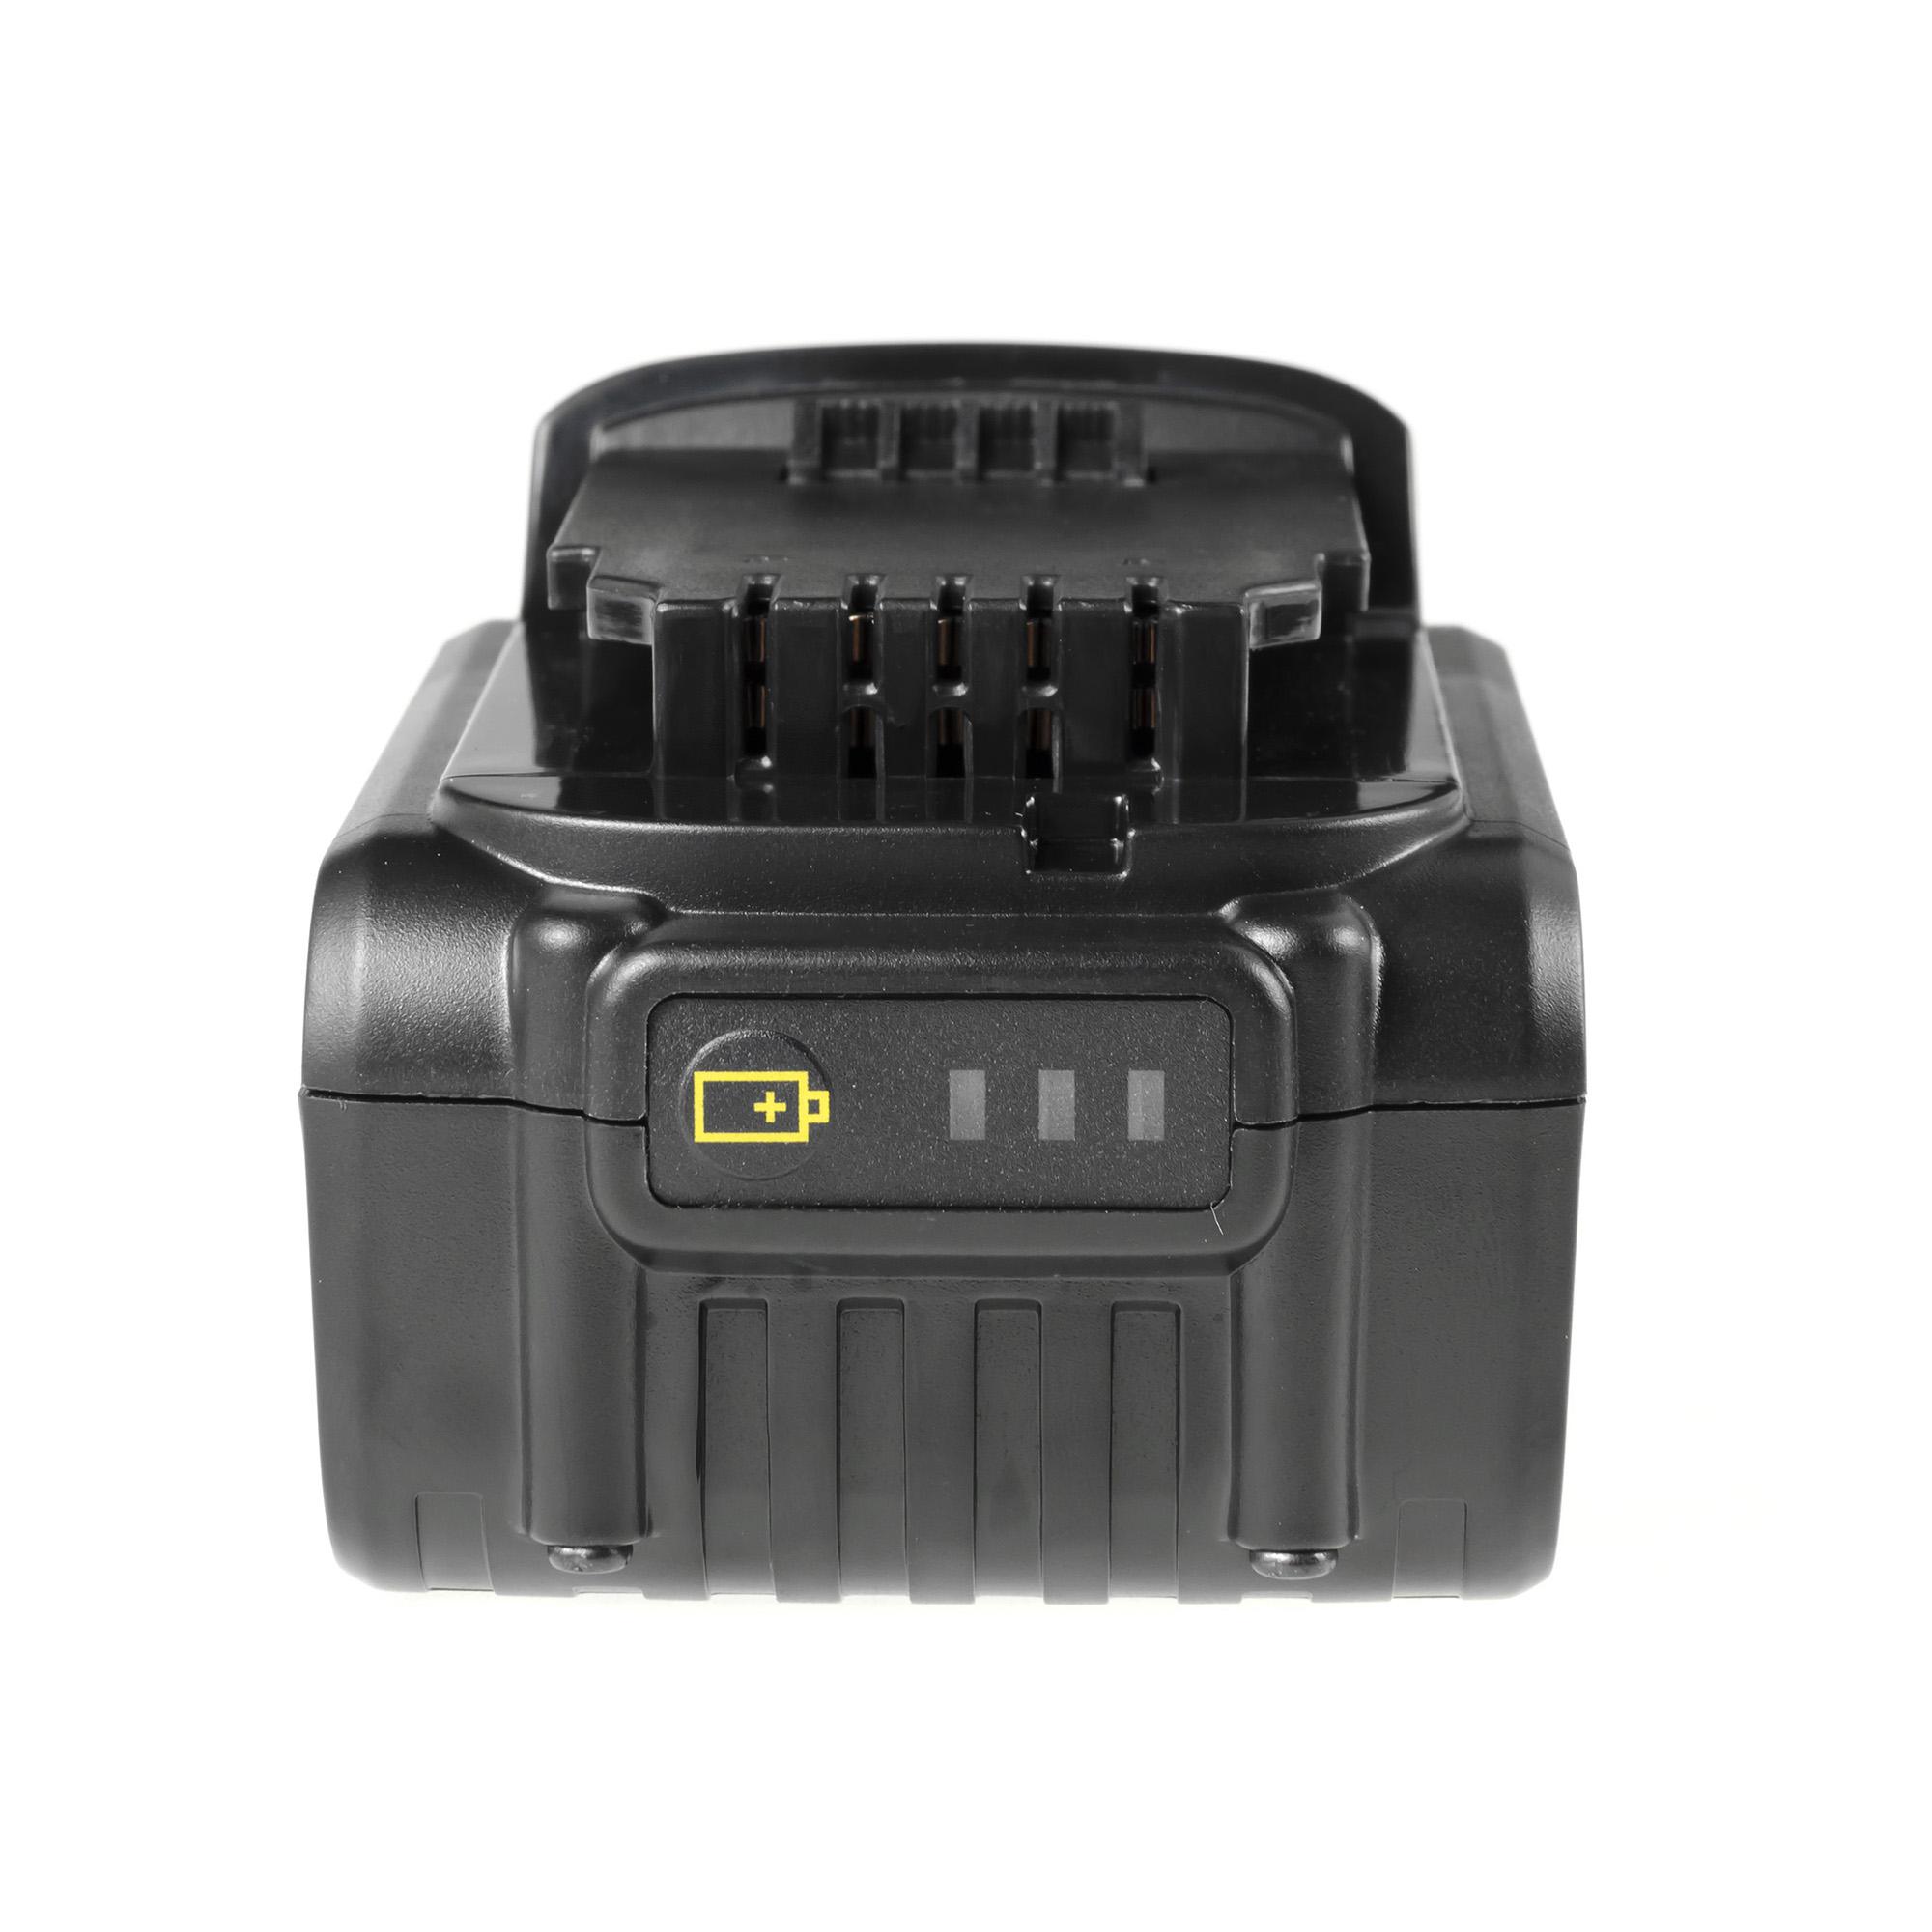 power tool cordless battery for dewalt dcf899p2 dcg405n. Black Bedroom Furniture Sets. Home Design Ideas